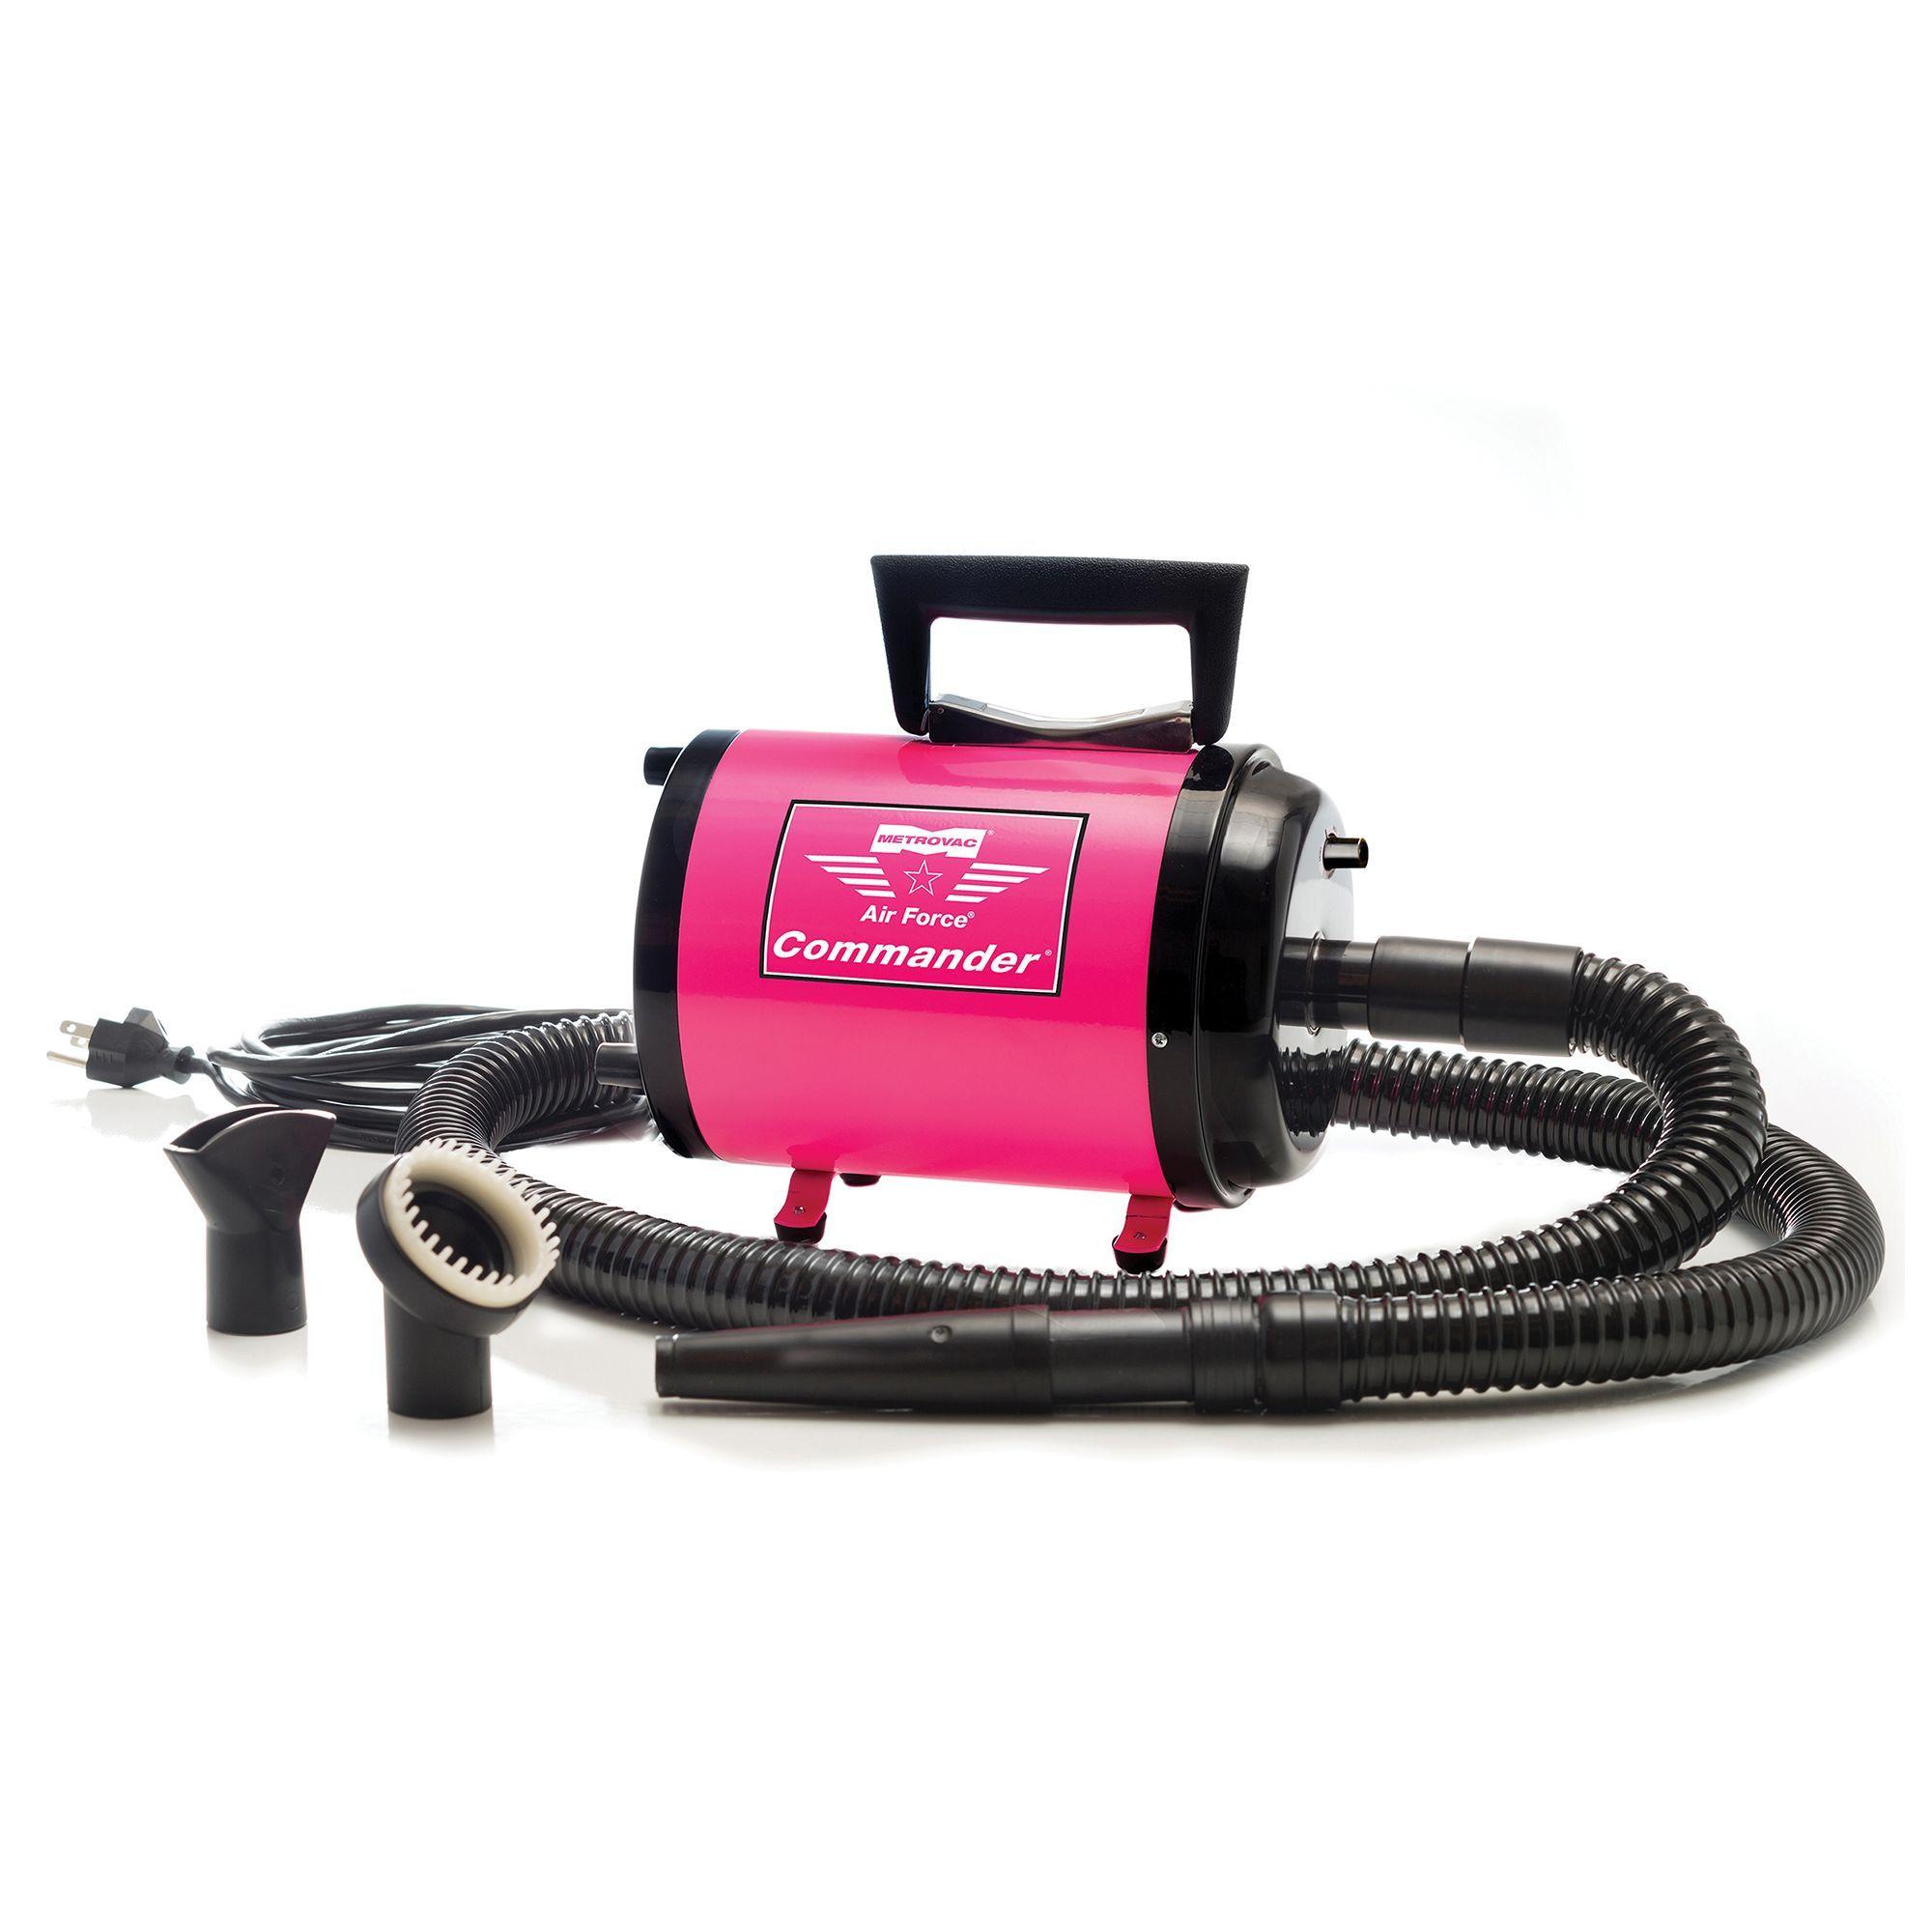 MetroVac Commander Variable Speed Pet Dryer, Pink Dog